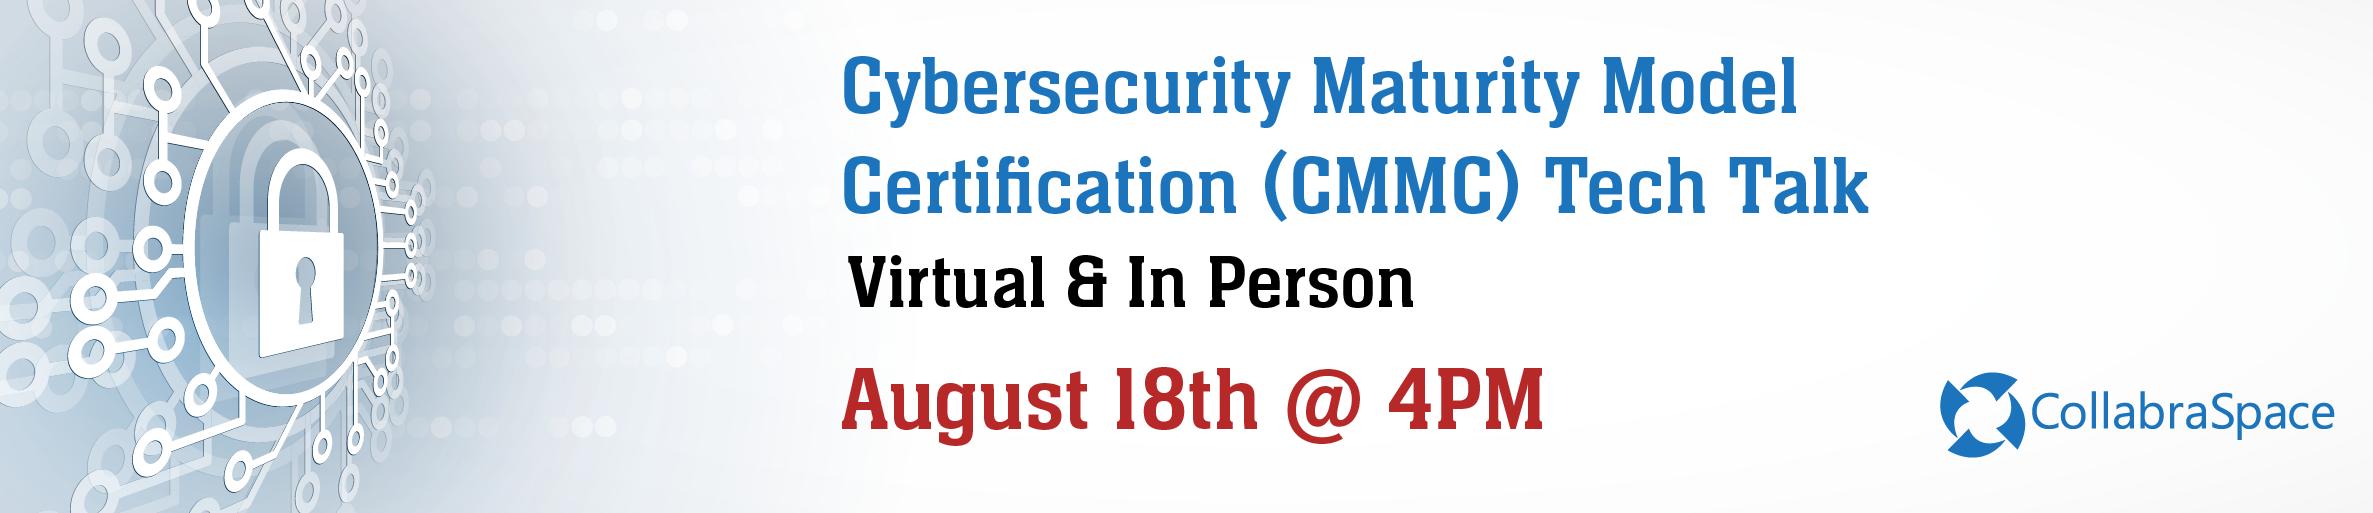 Virtual & In Person Tech Talk: Cybersecurity Maturity Model Certification (CMMC)